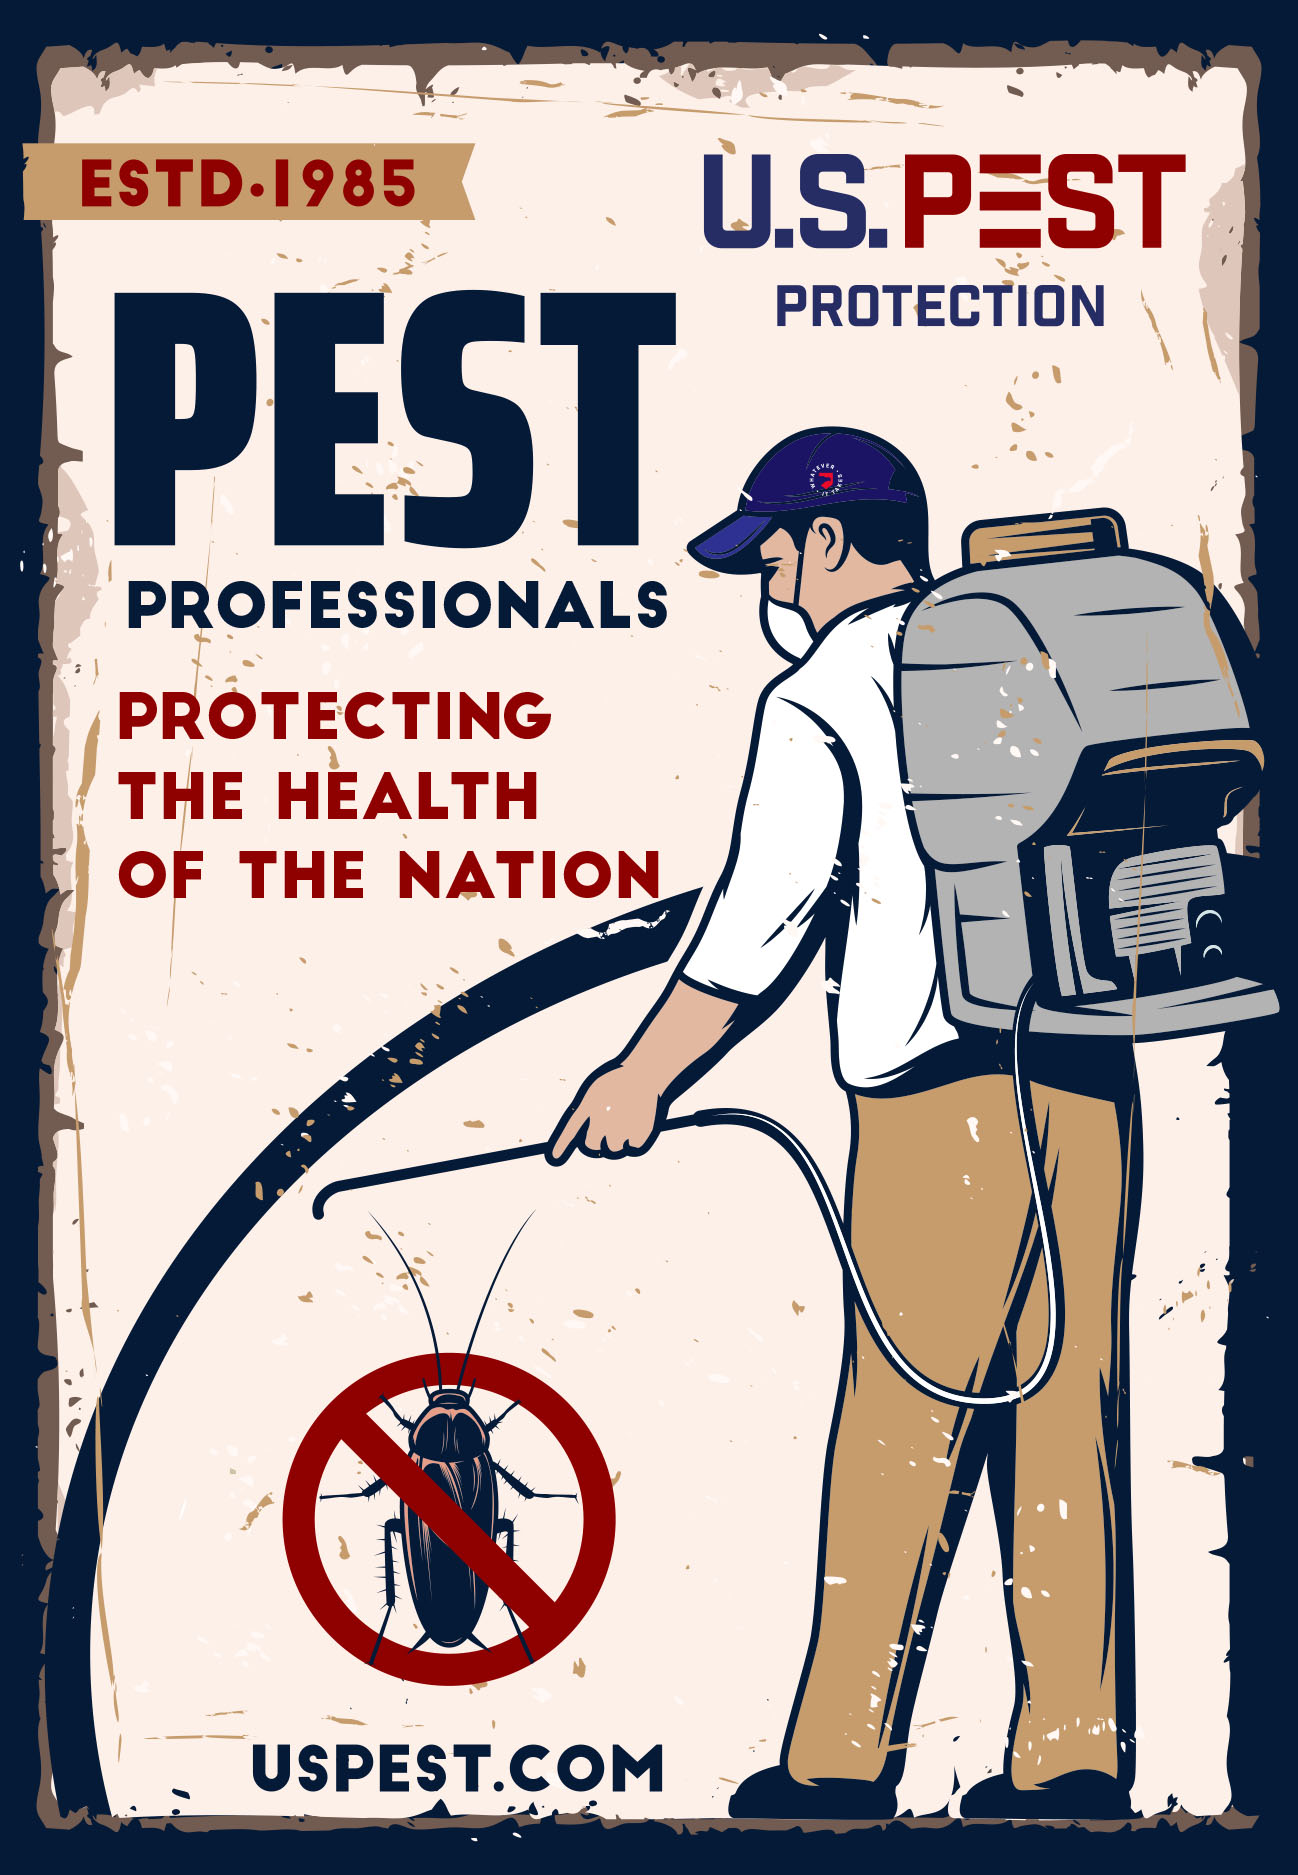 Importance of Pest Control | U.S. Pest Protection